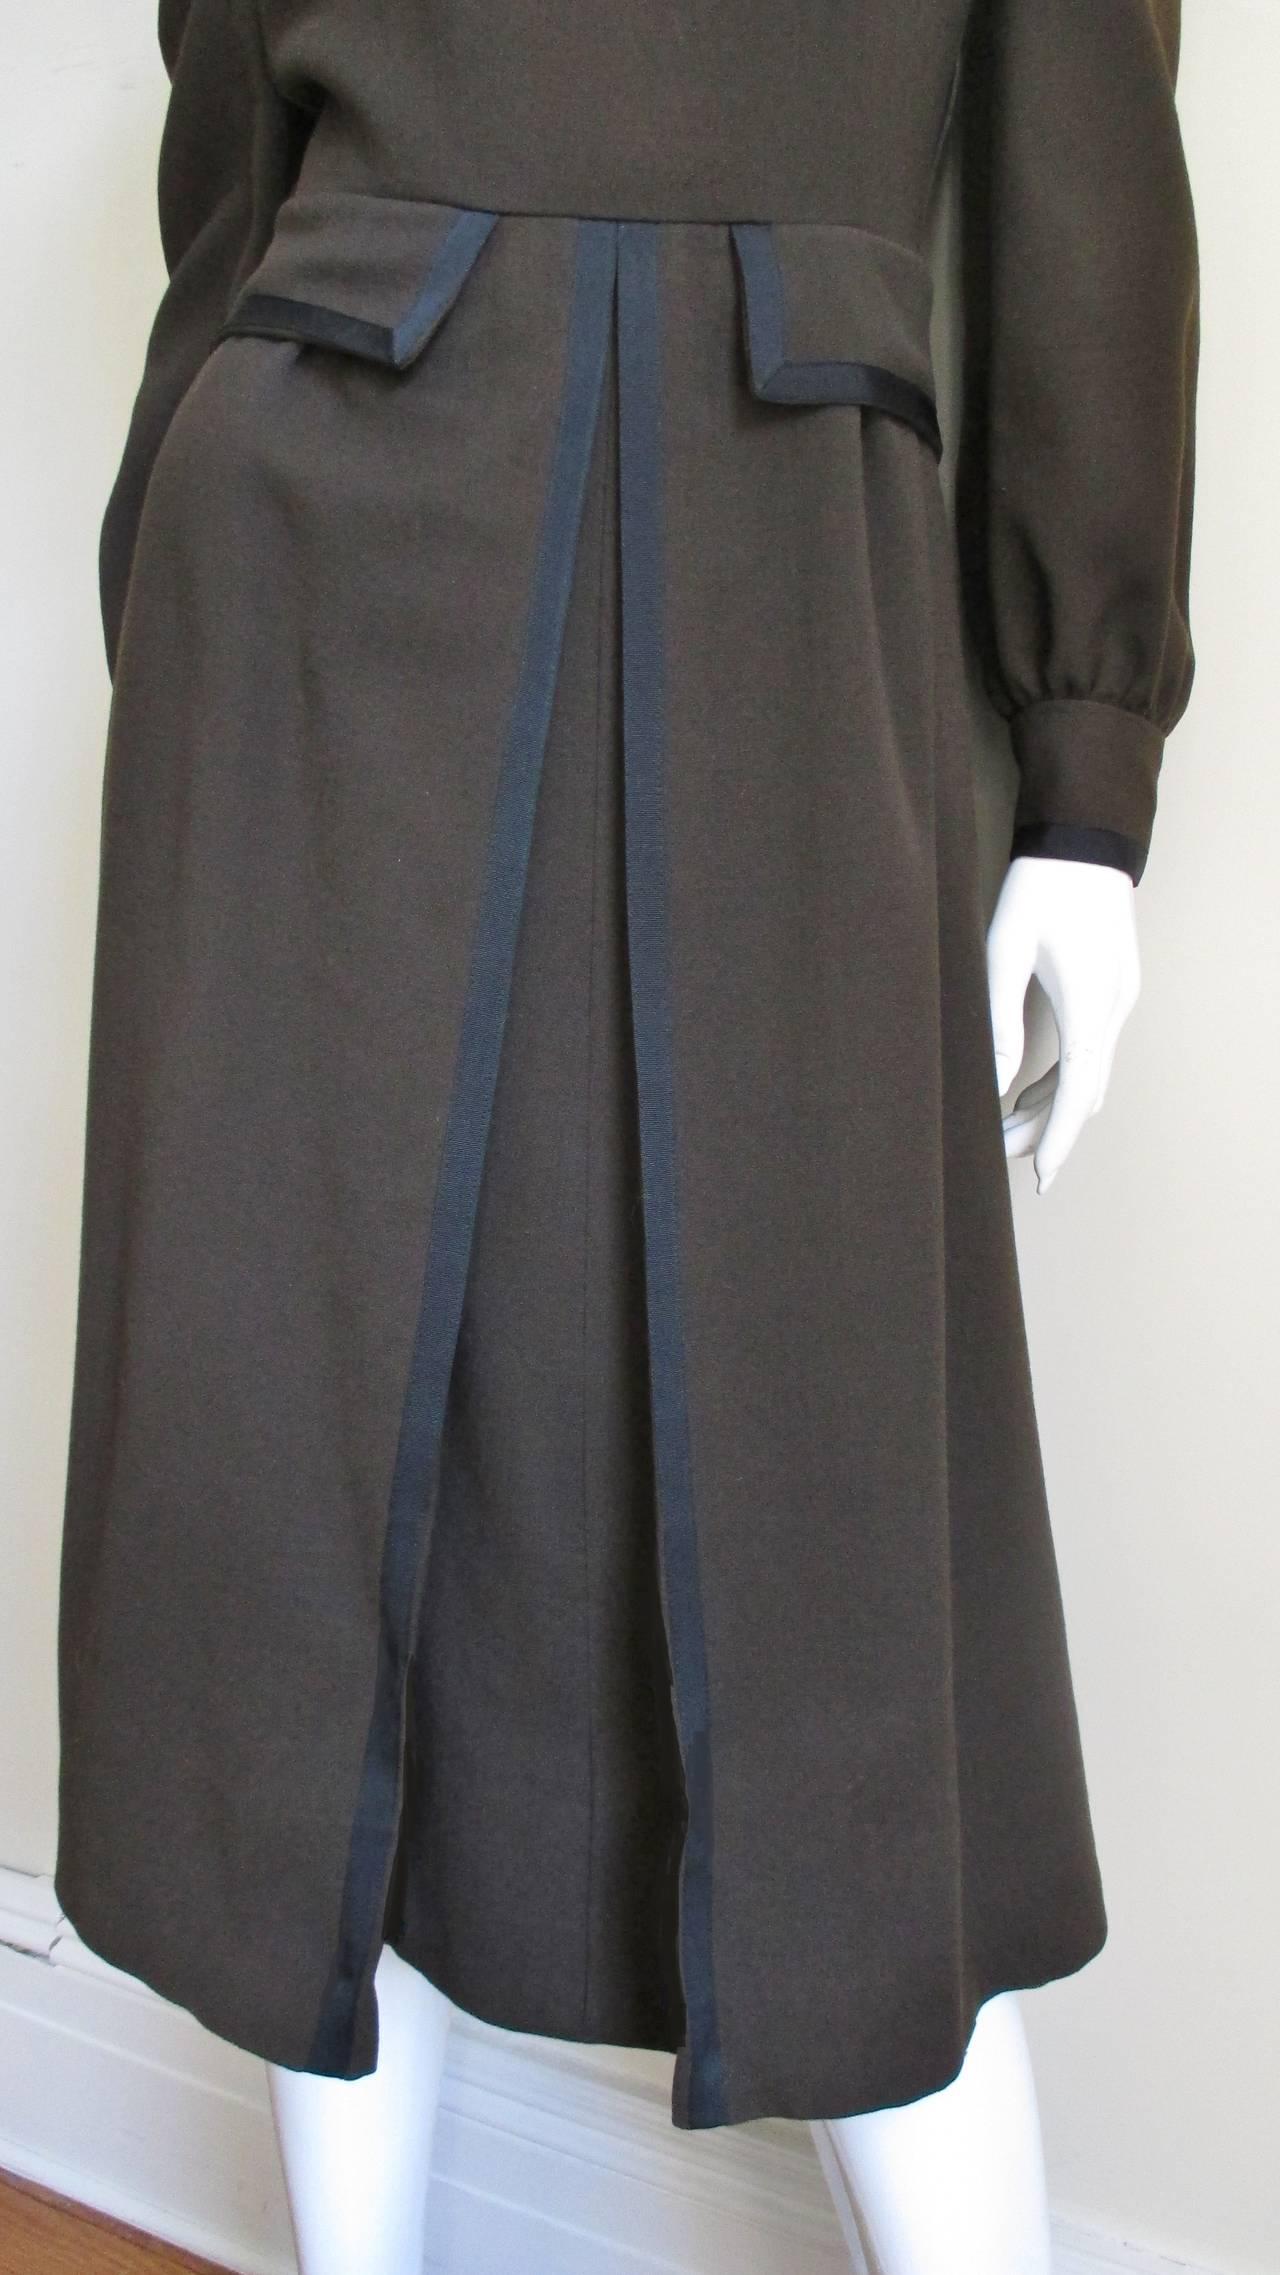 Iconic Geoffrey Beene 1970's Dress 3